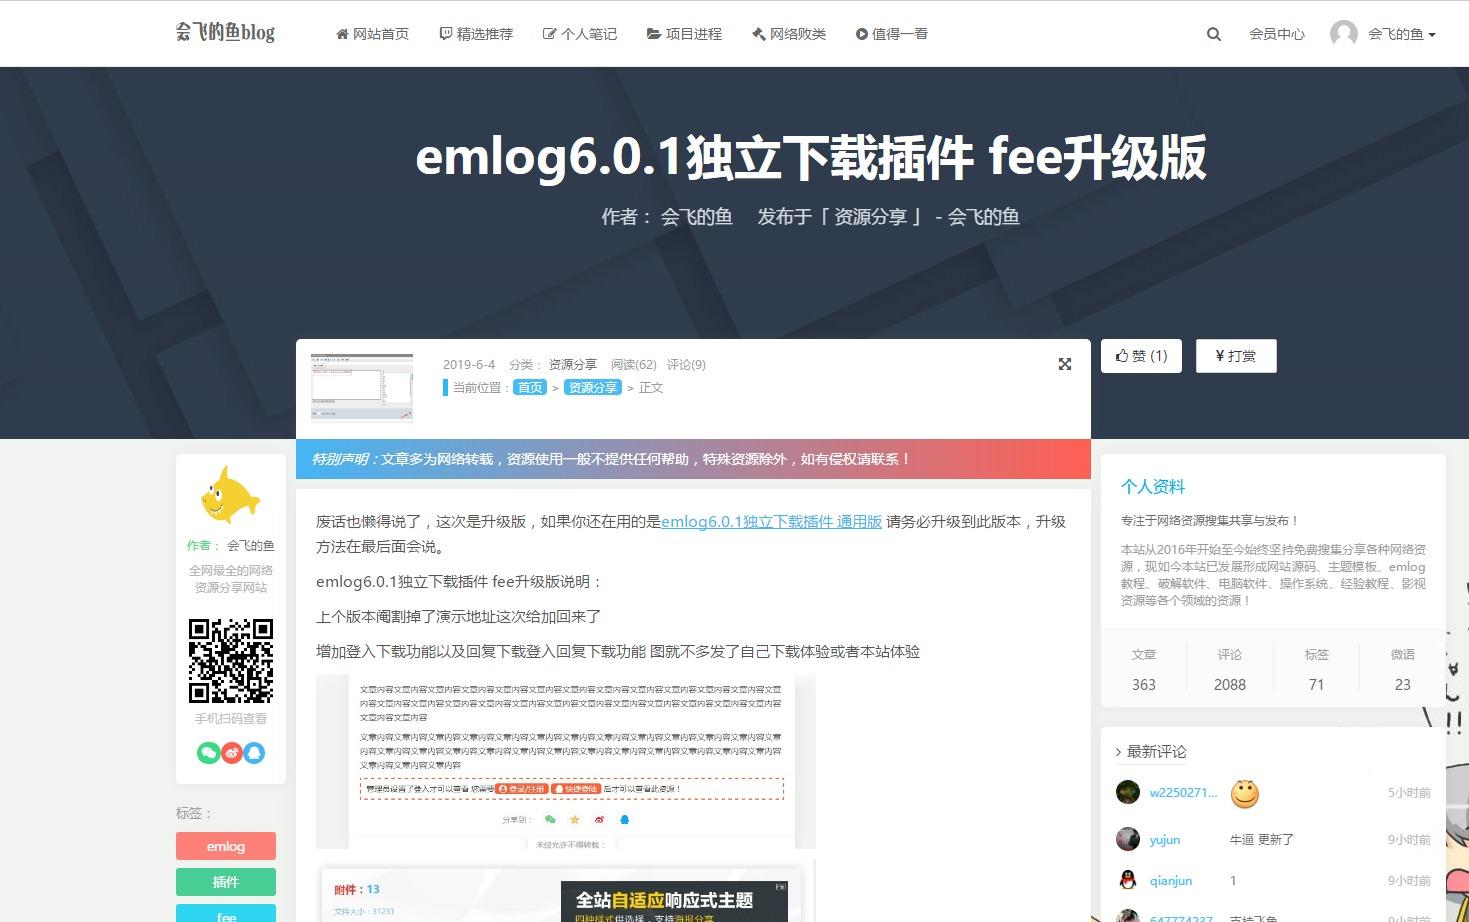 emlog模板:fee主题商业版V2.1 ,Emlog模板,Emlogfee模板,fee主题,fee模板,fee简约模板,图文教程,分享,主题模板,建站,Emlog模板,第5张